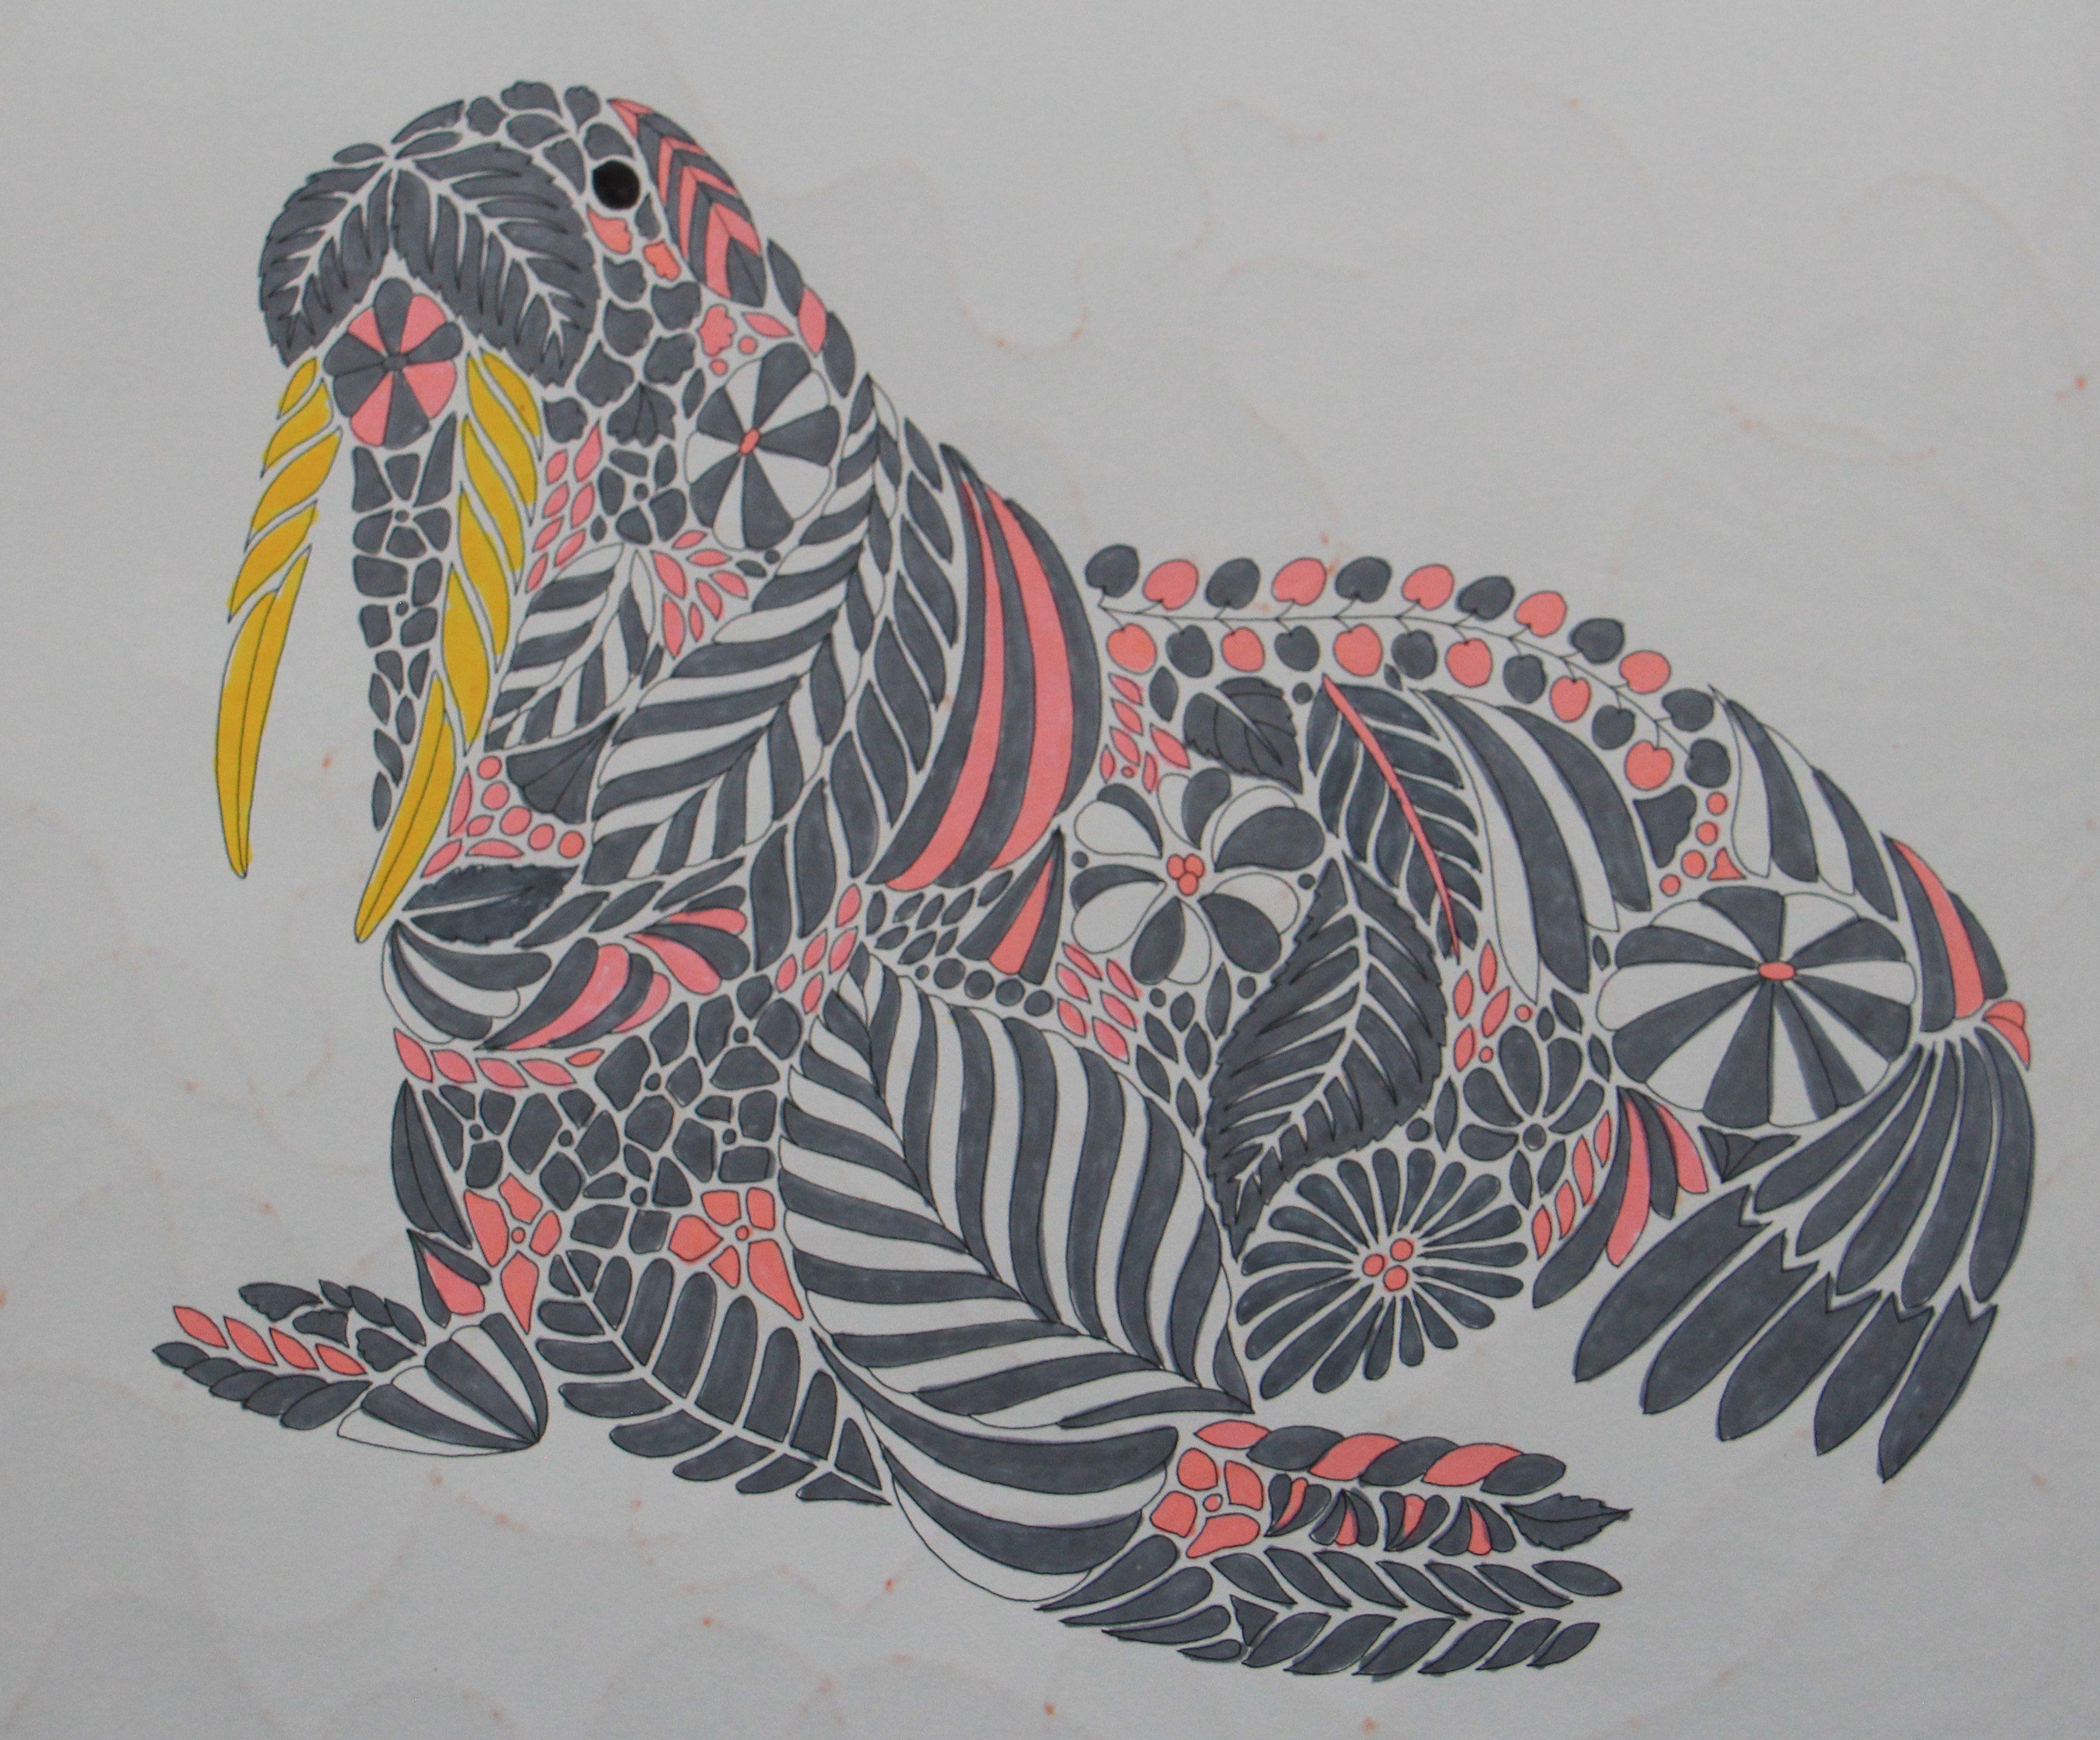 Walrus Millie Marotta Millie Marotta Coloring Book Curious Creatures [ 2877 x 3473 Pixel ]